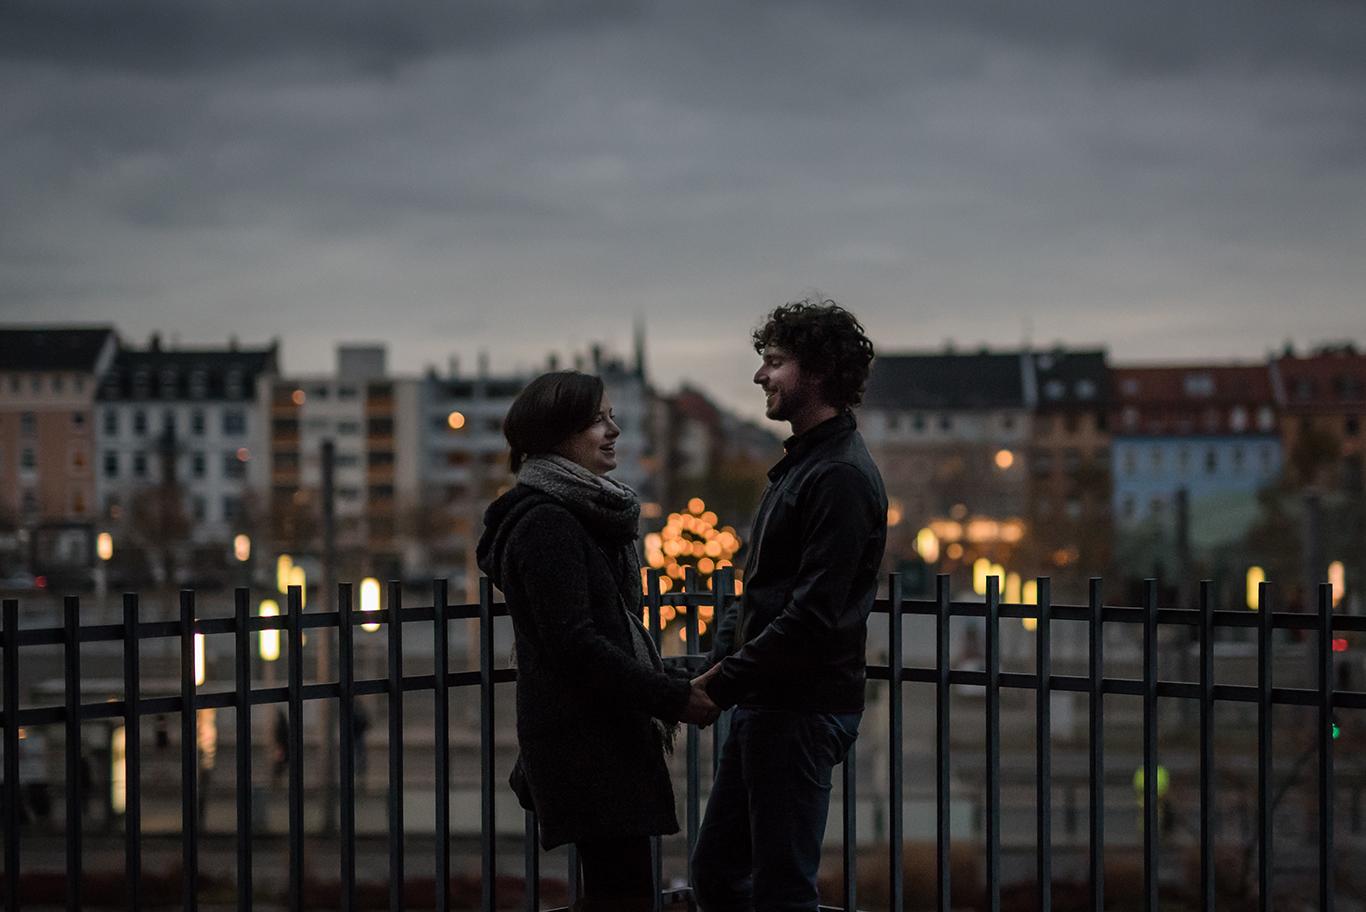 Gallerie | Verliebt Verlobt 23